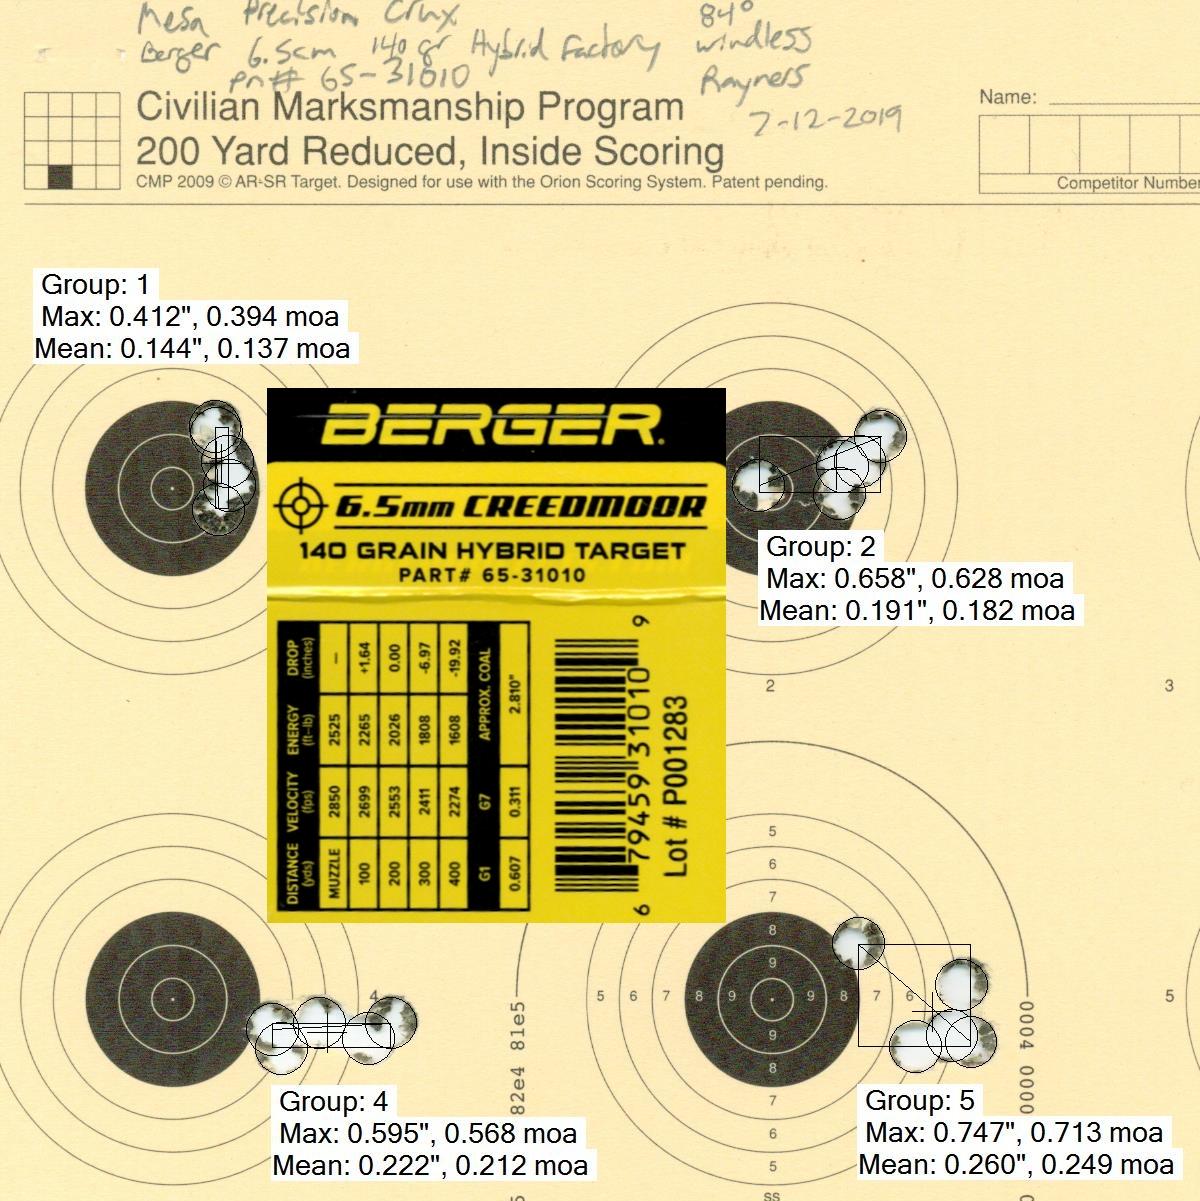 Berger 140gr hybrid testing w/ Mesa Precision Arms Crux